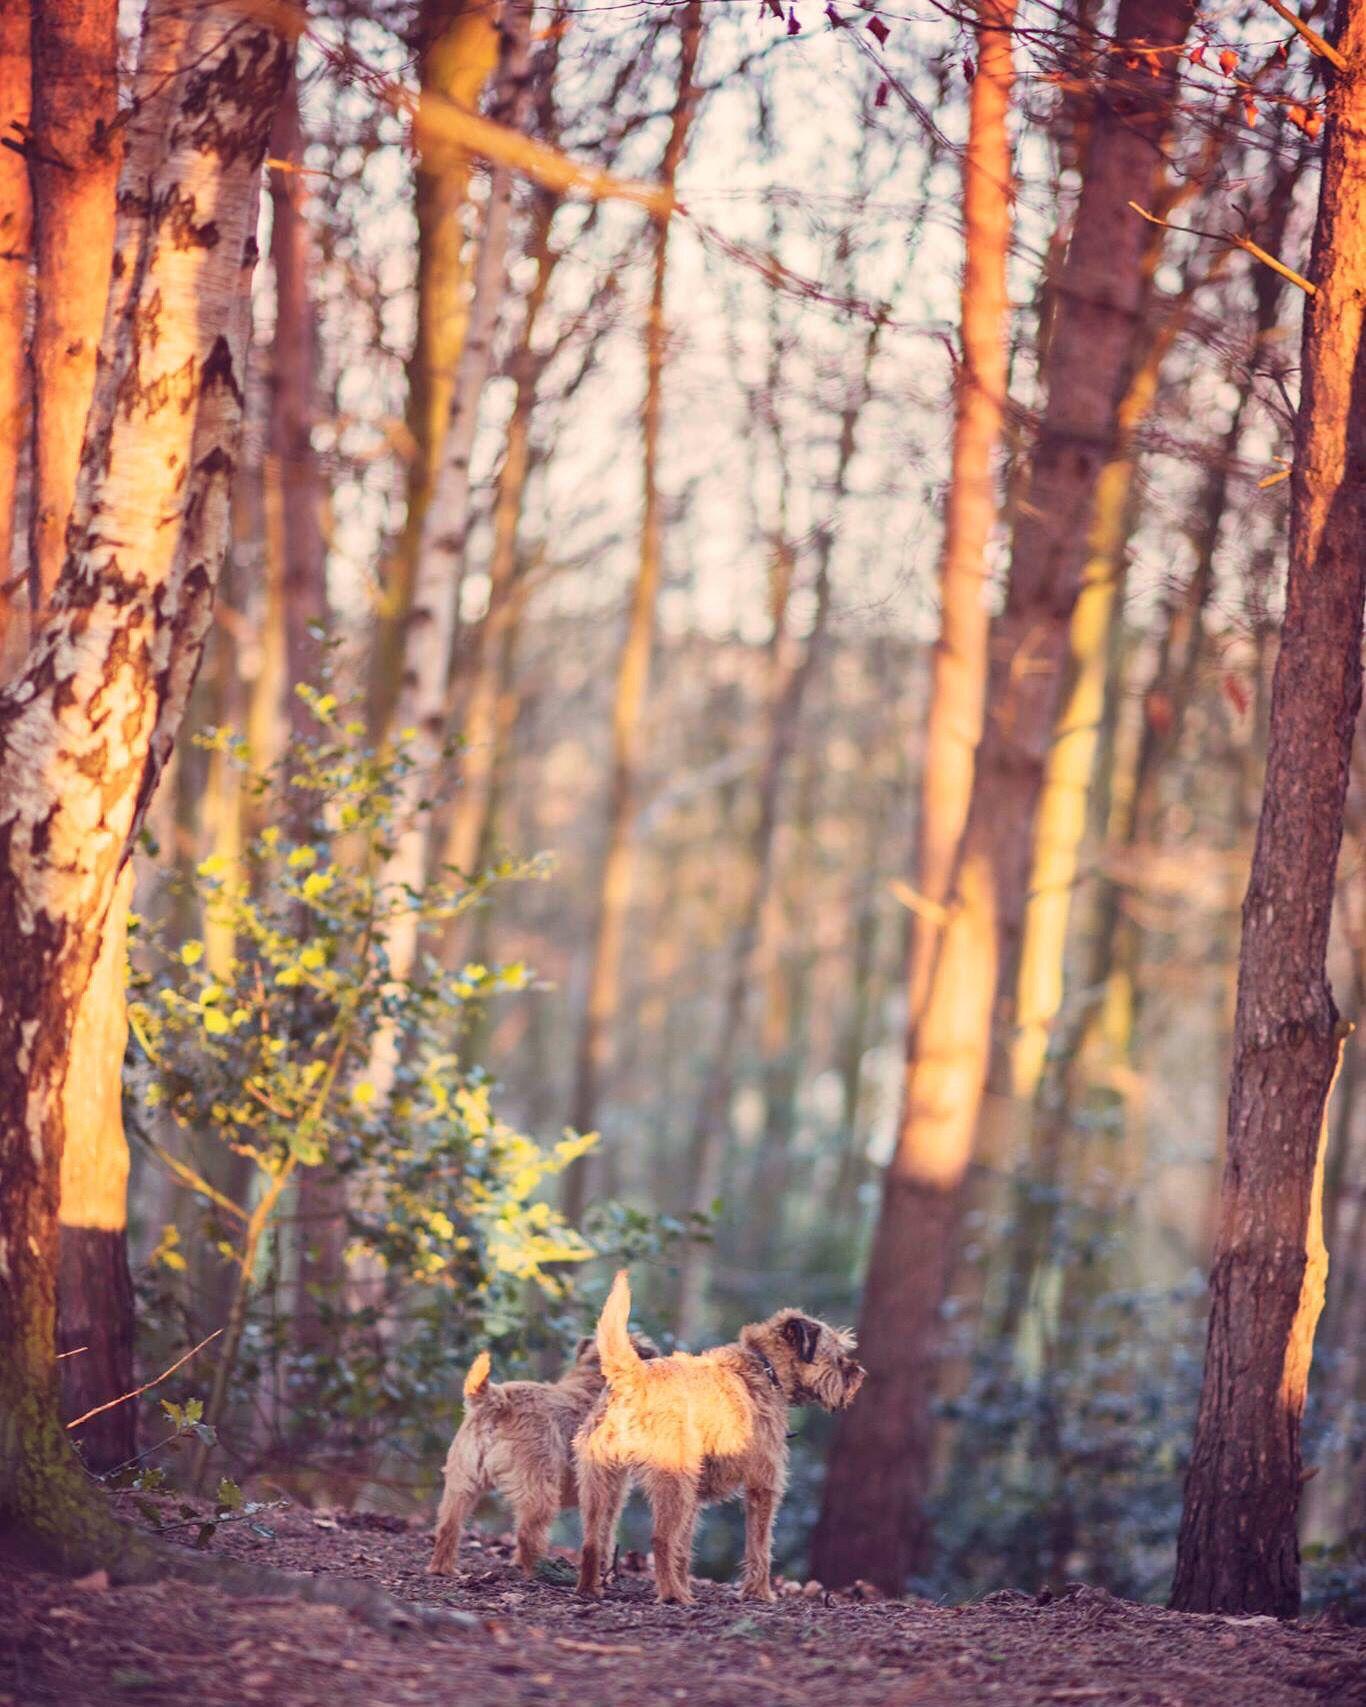 Dynamic Doggy Duo Www Eyesomephotography Com Petphotos Animal Photo Animals Doggy